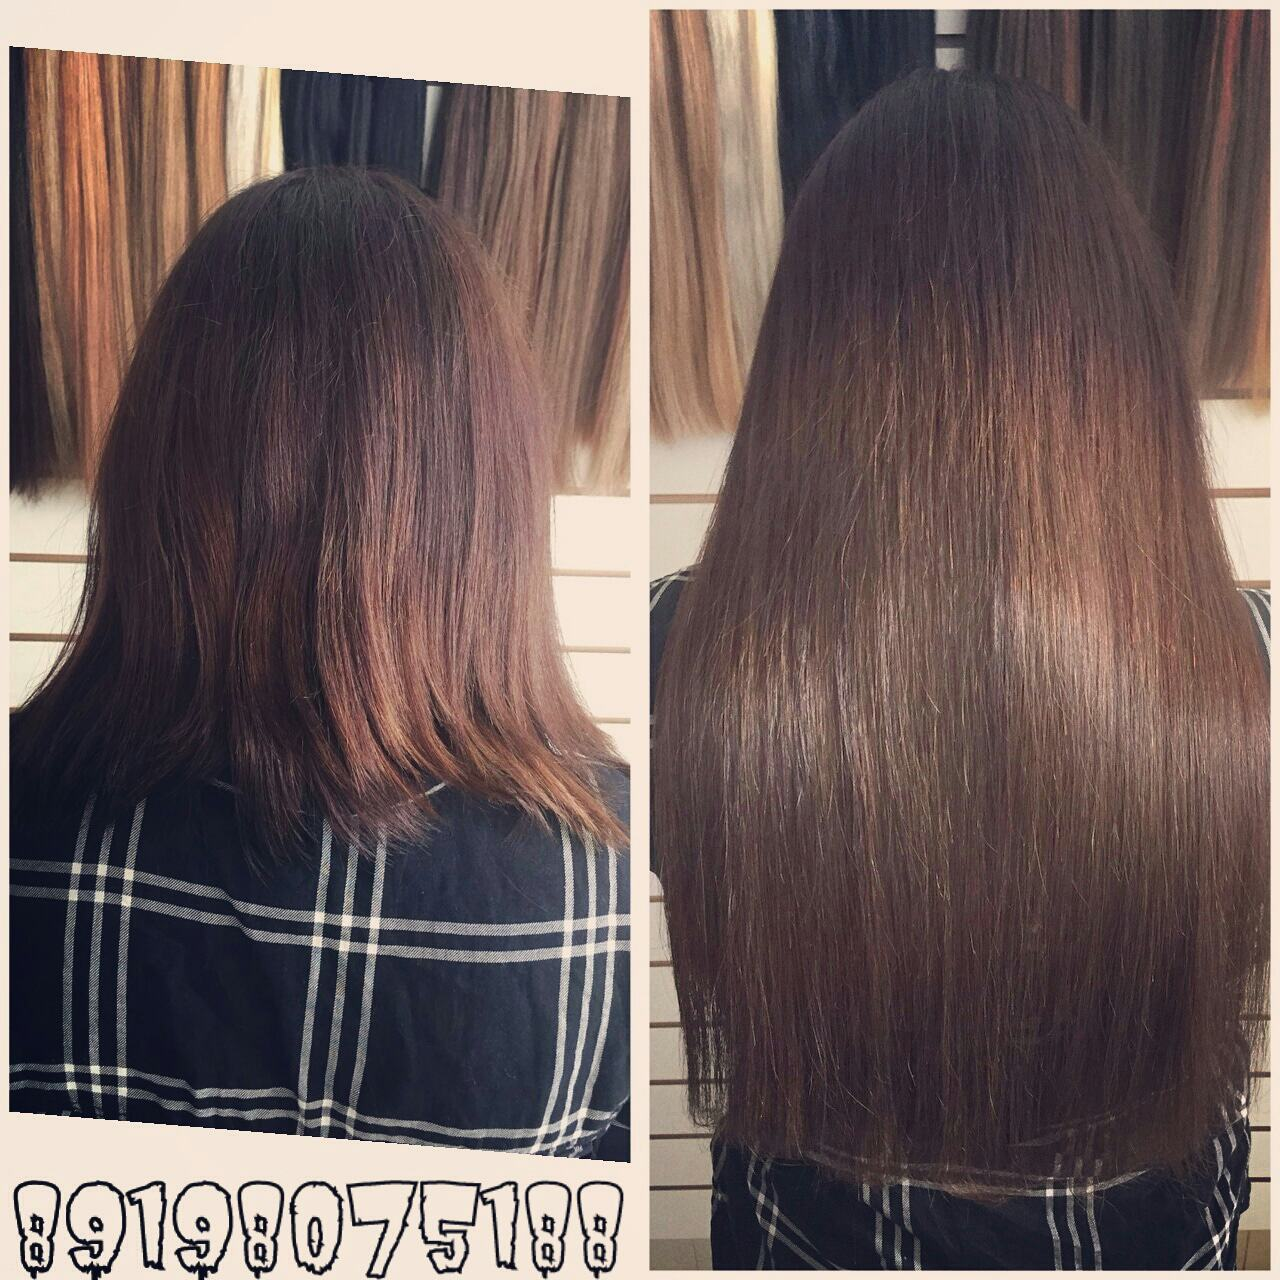 наращивание волос 1